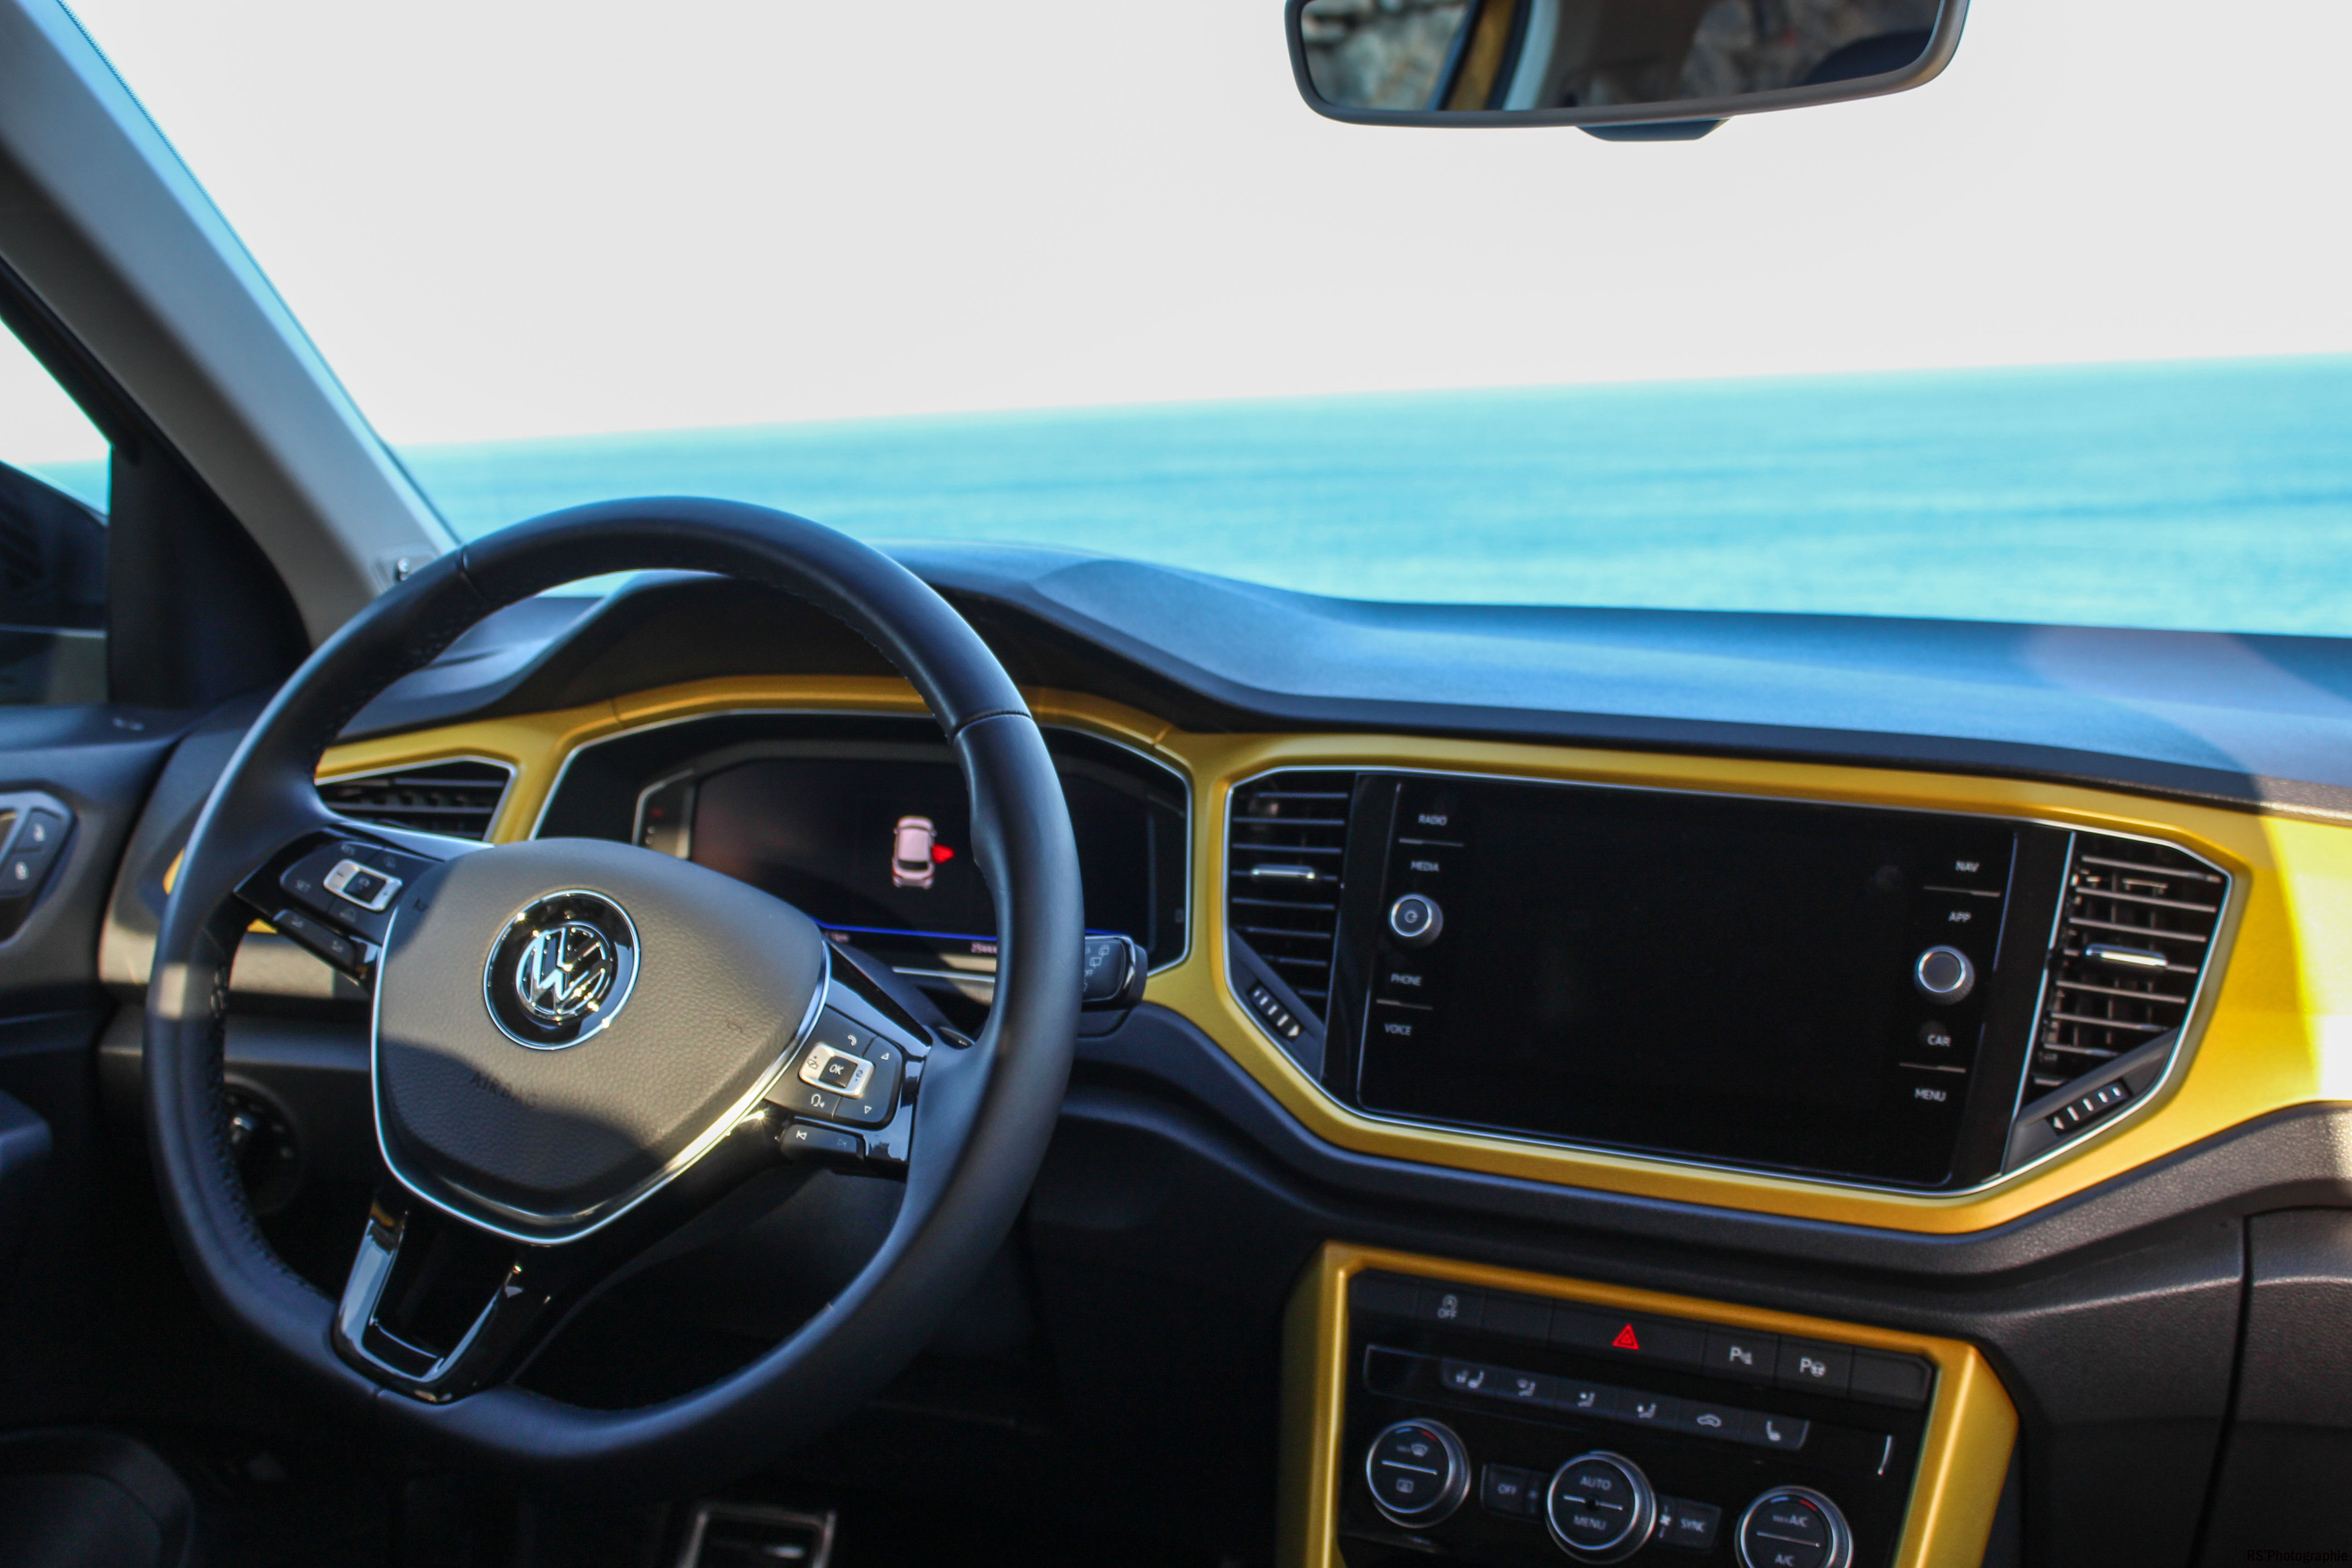 Volkswagentroc101-vw-t-roc-intérieur-onboard-Arnaud Demasier-RSPhotographie